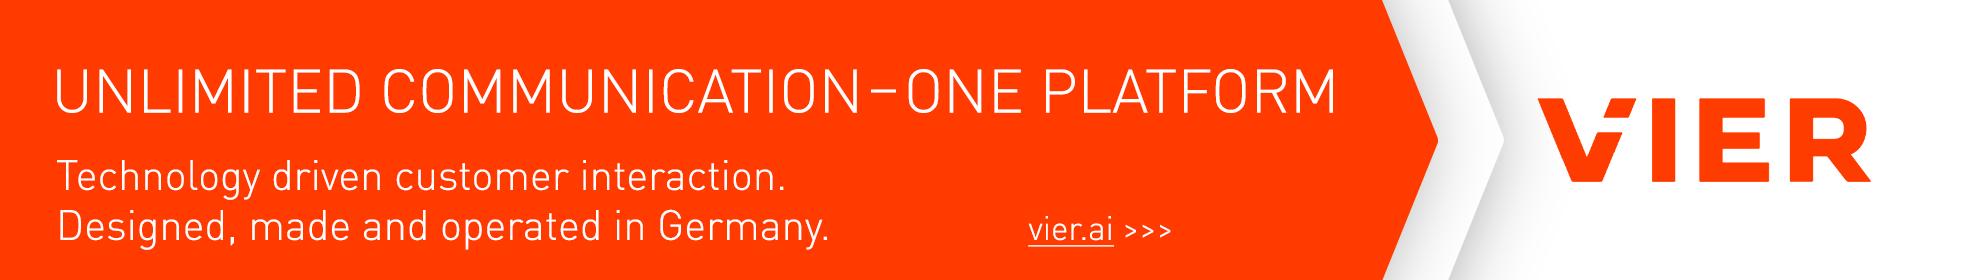 Unlimited communication - one platform: vier.ai